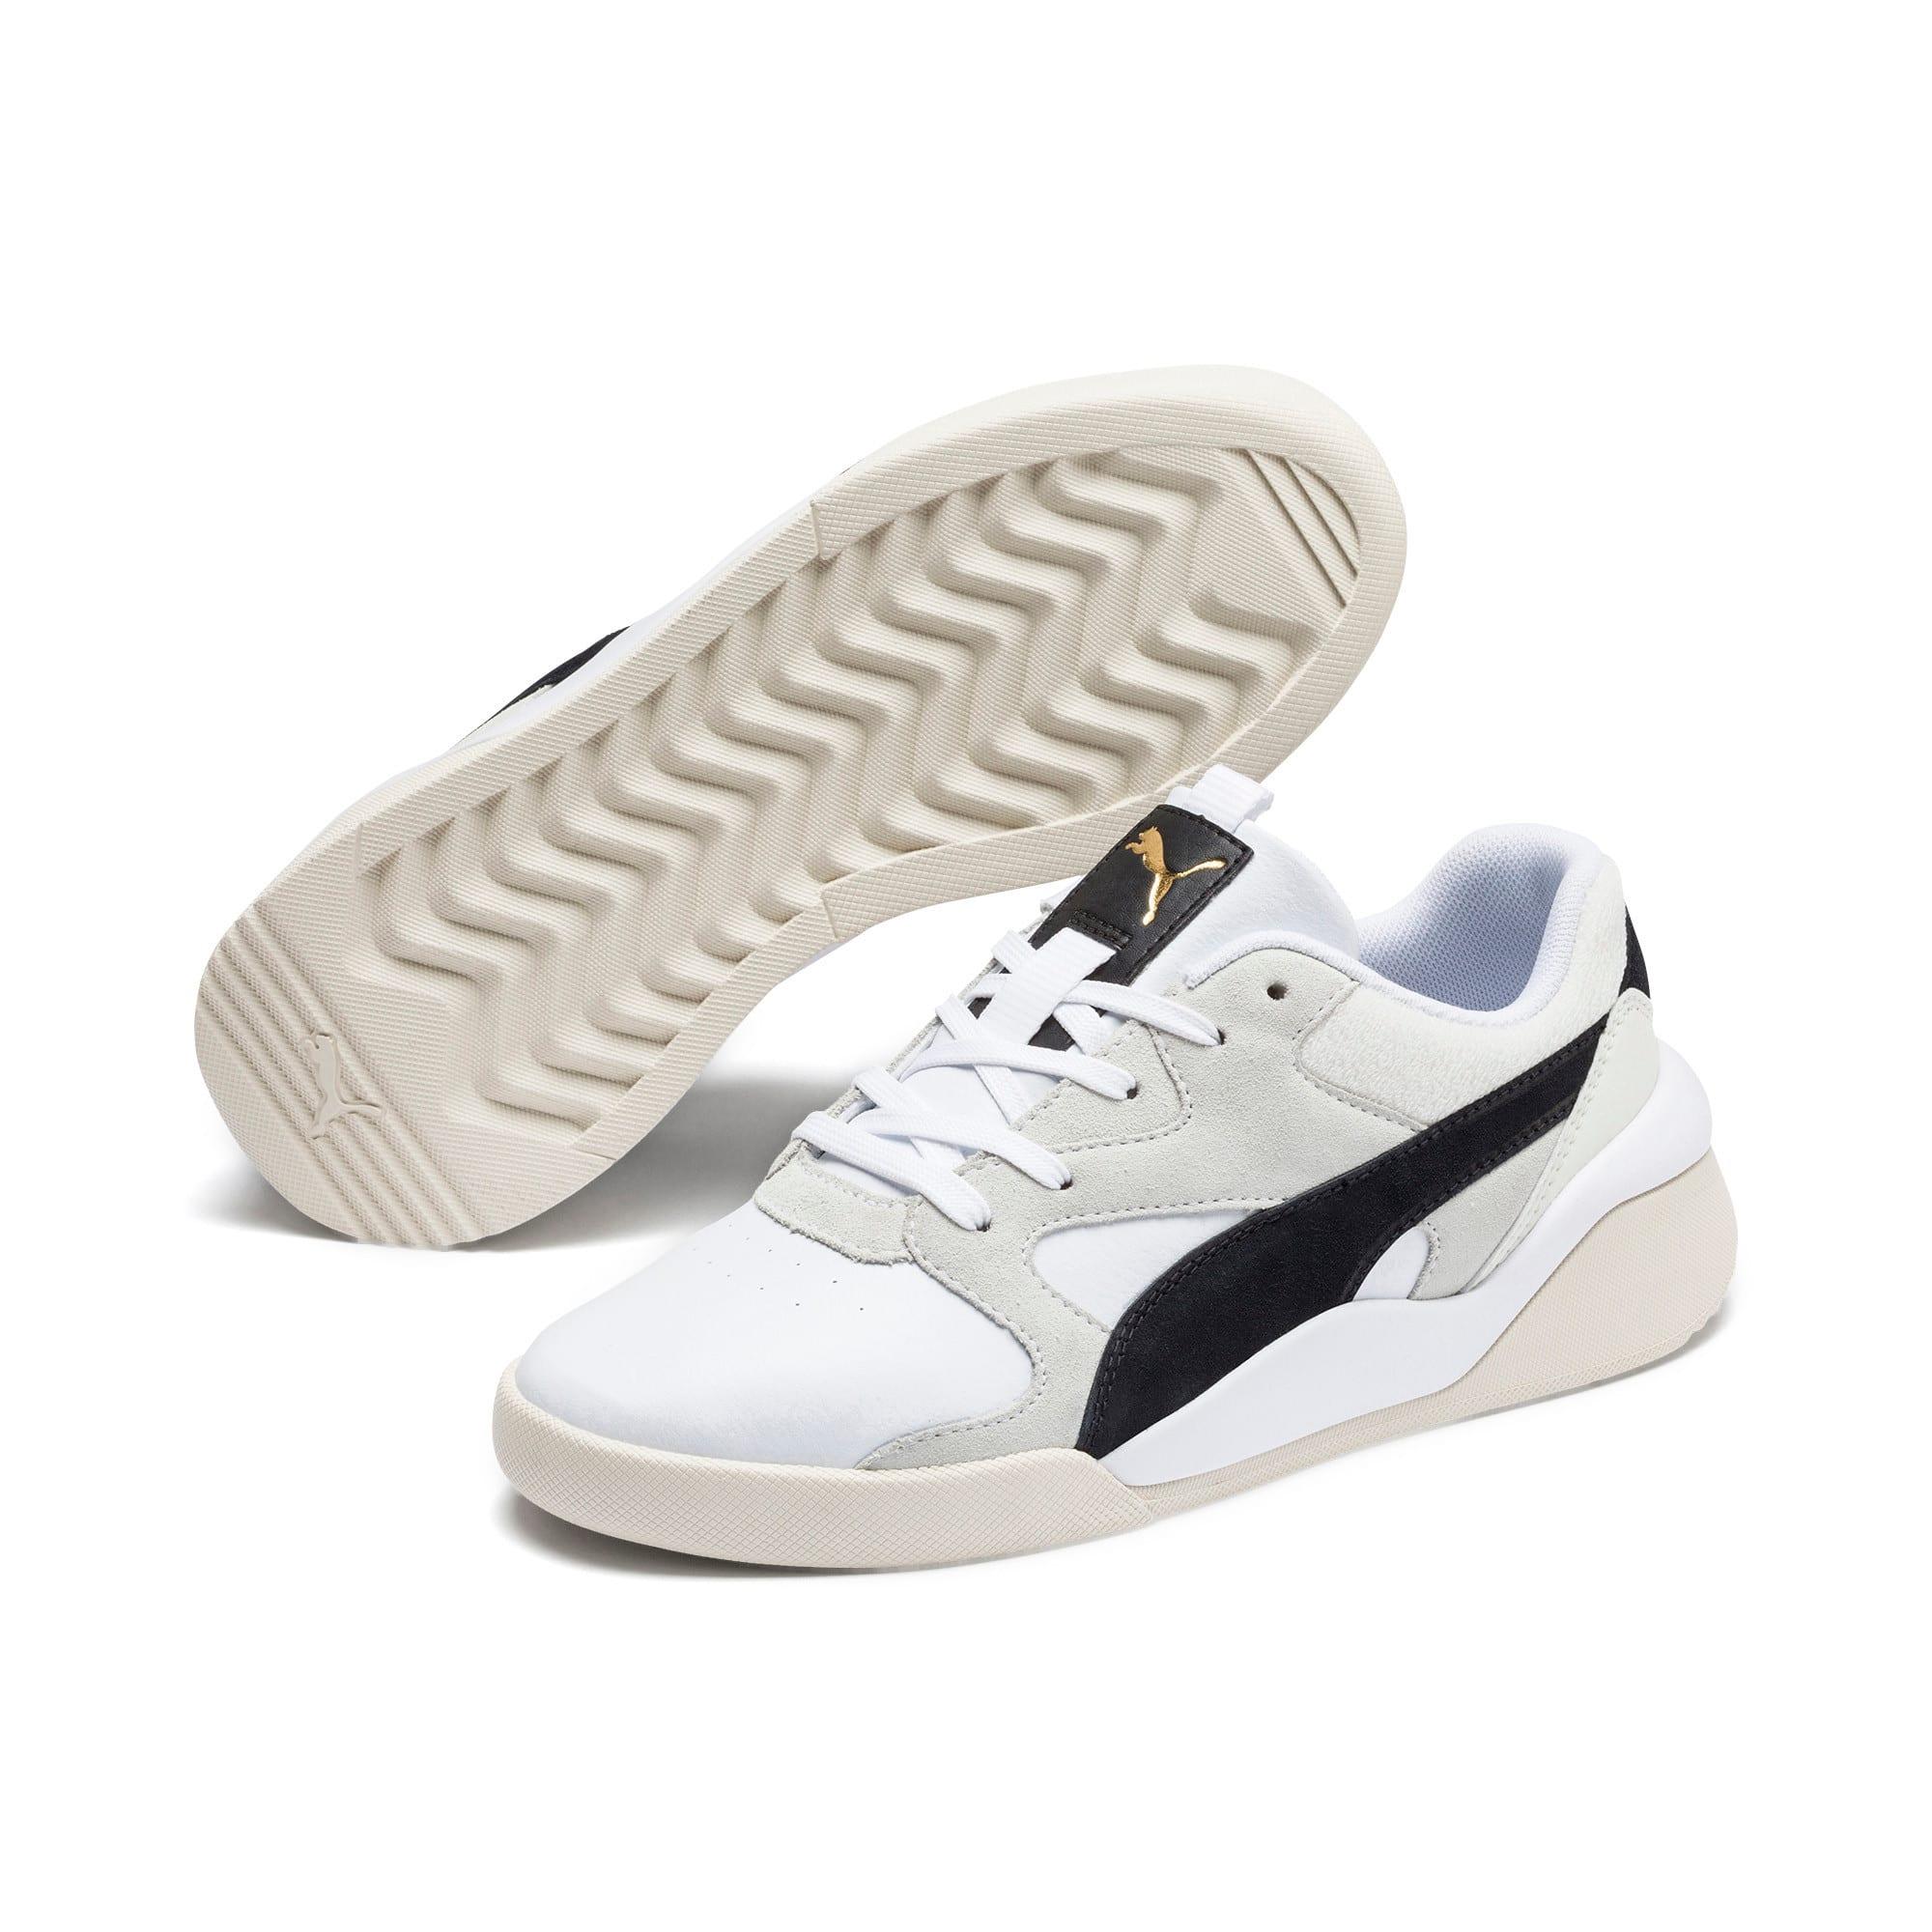 Thumbnail 3 of Aeon Heritage Women's Sneakers, Puma White-Puma Black, medium